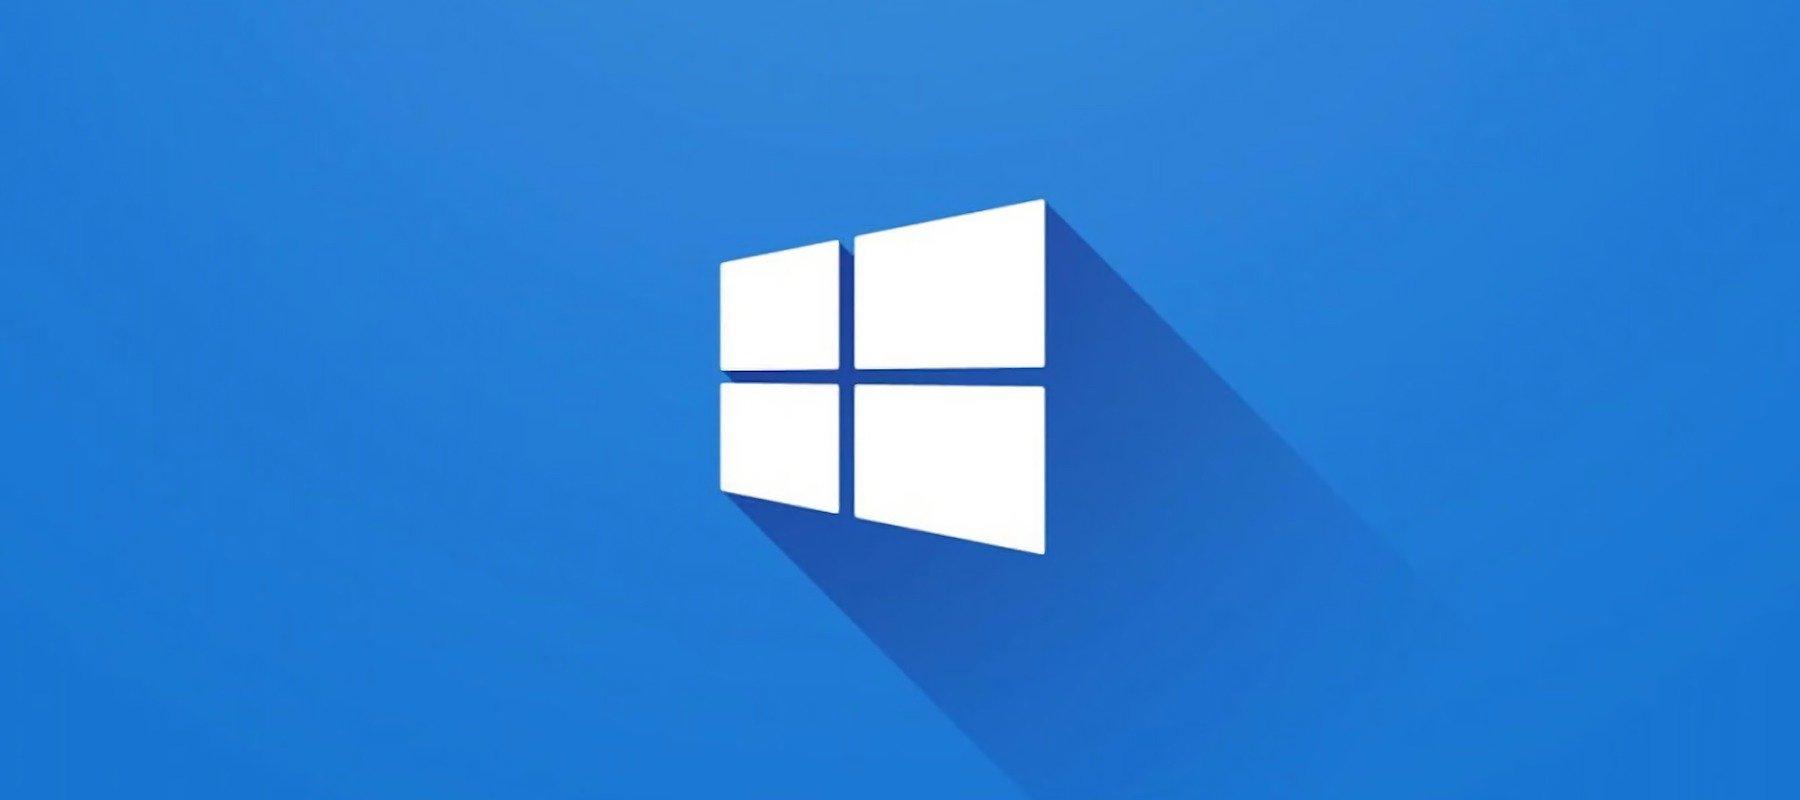 Windows 10 1909 最新正式版系统镜像下载地址